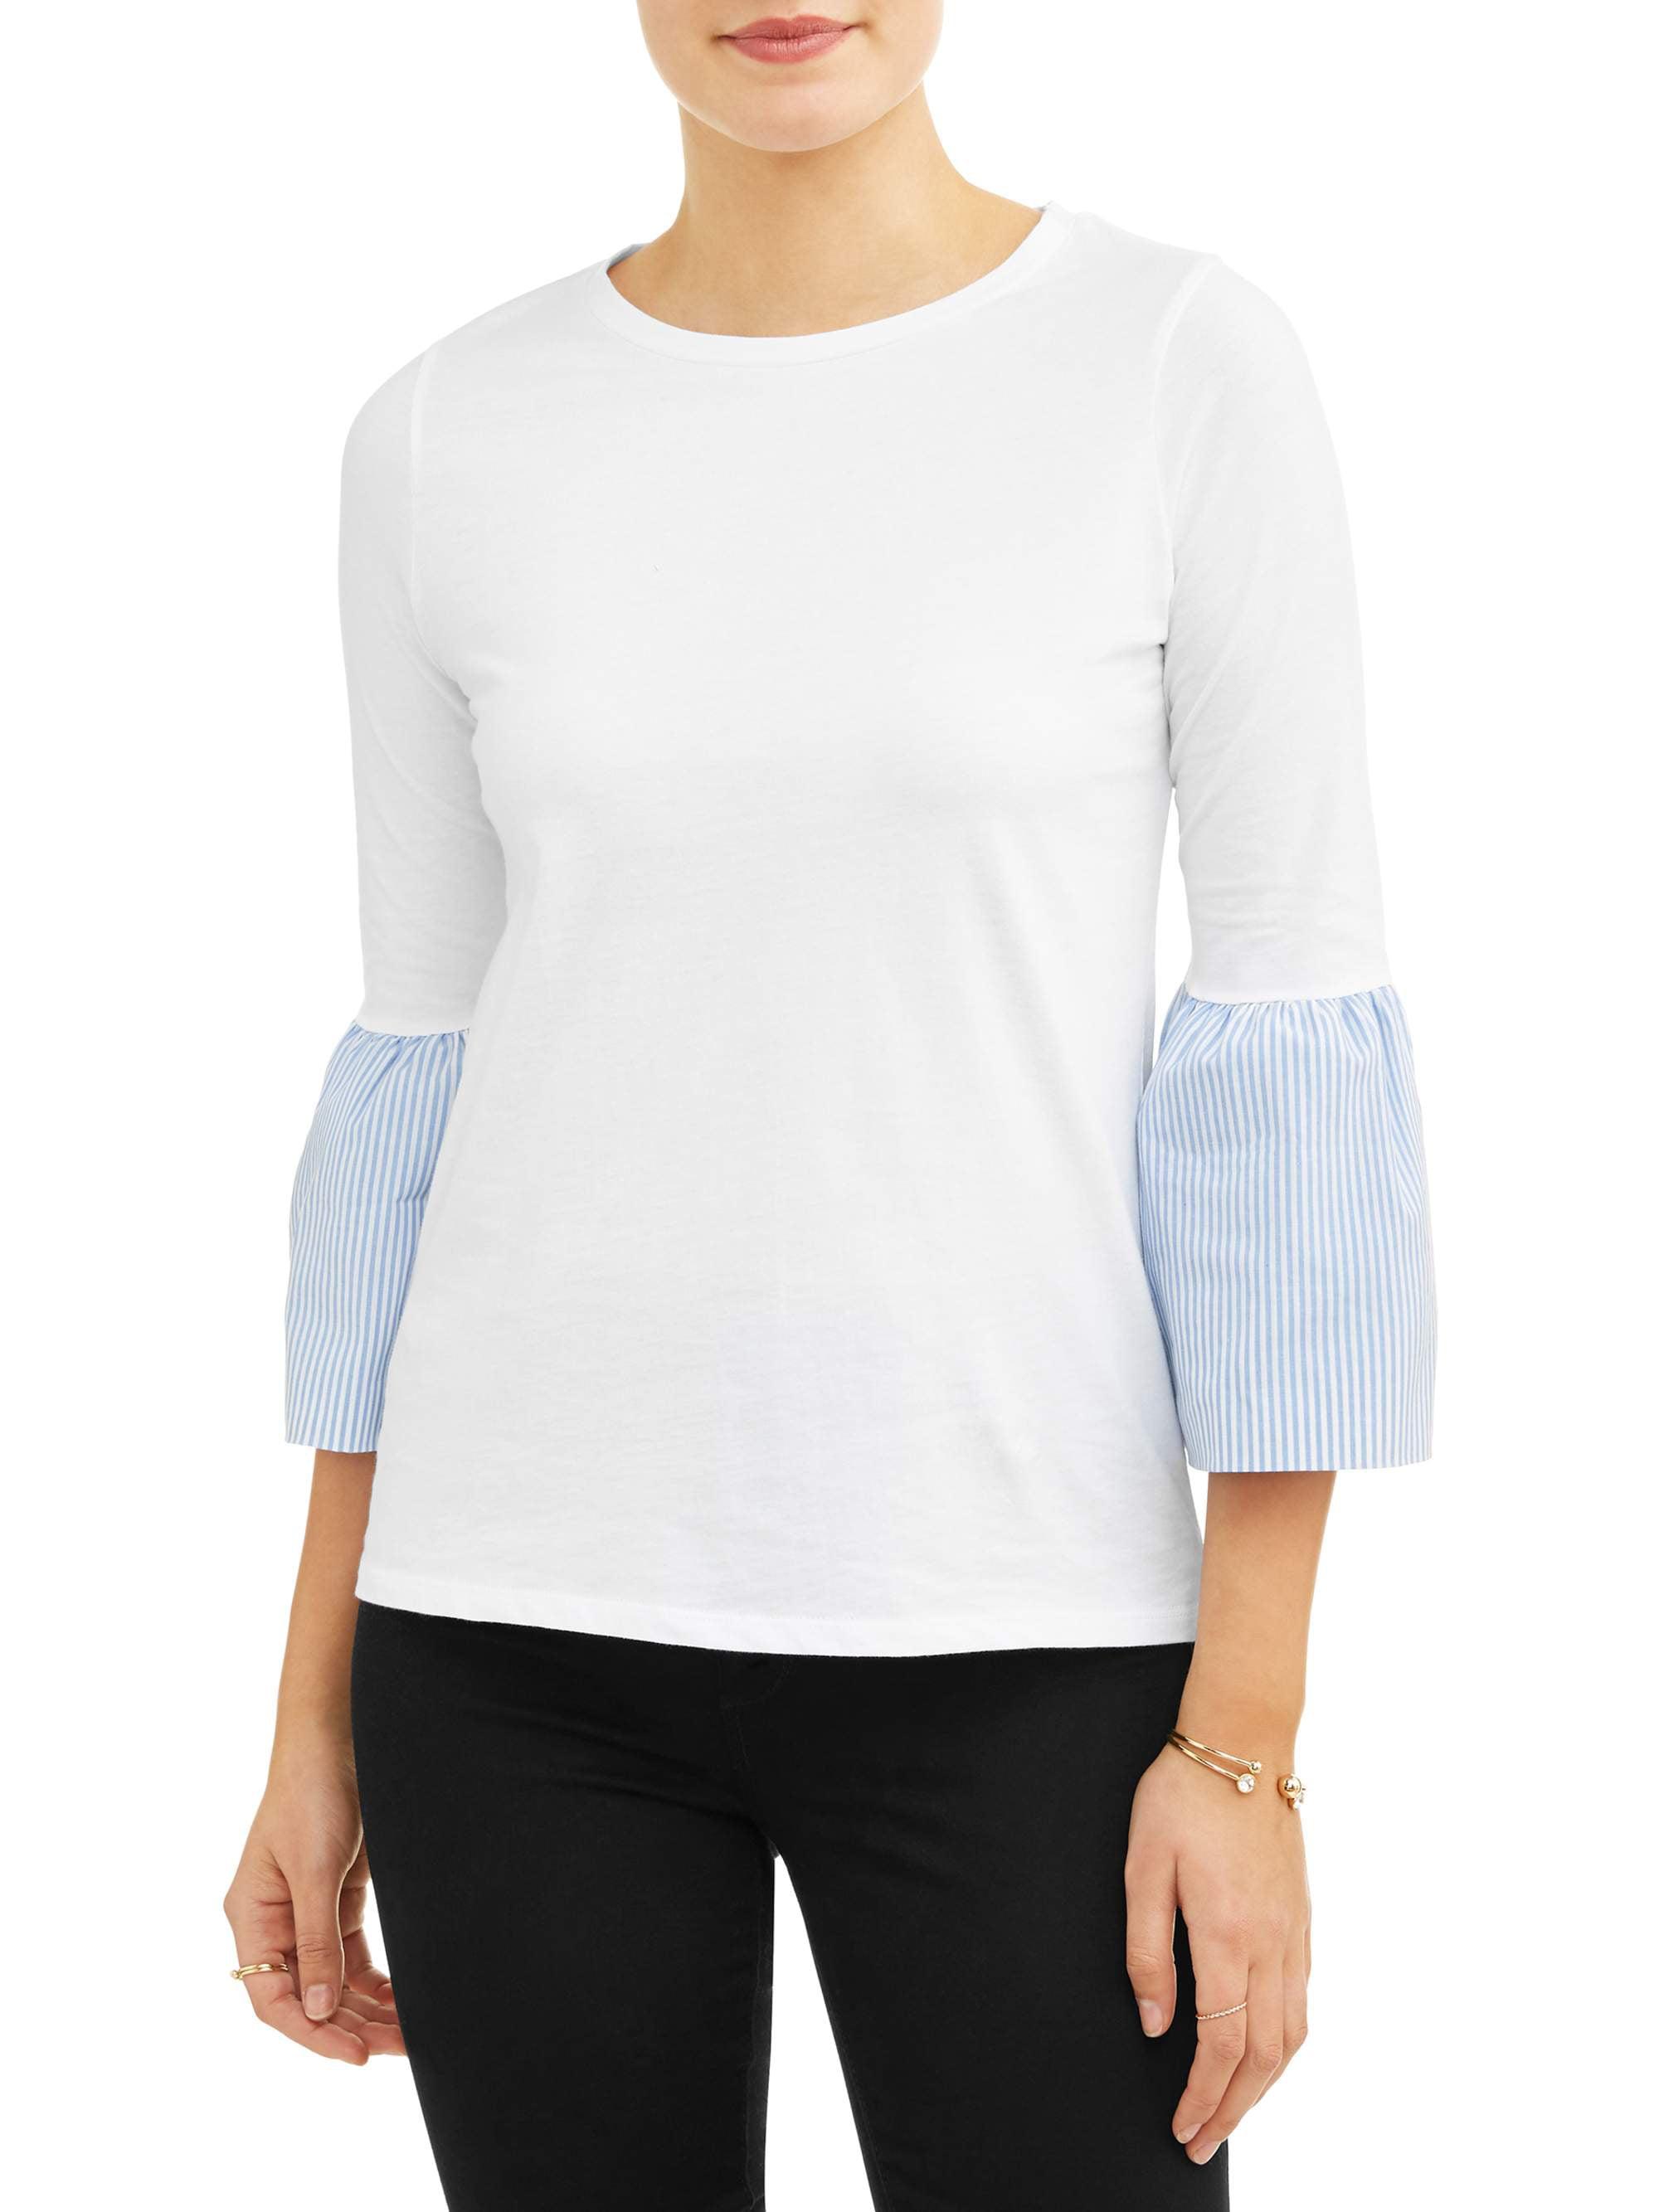 Alison Andrews Women's Long Sleeve Statement Sleeve T-Shirt